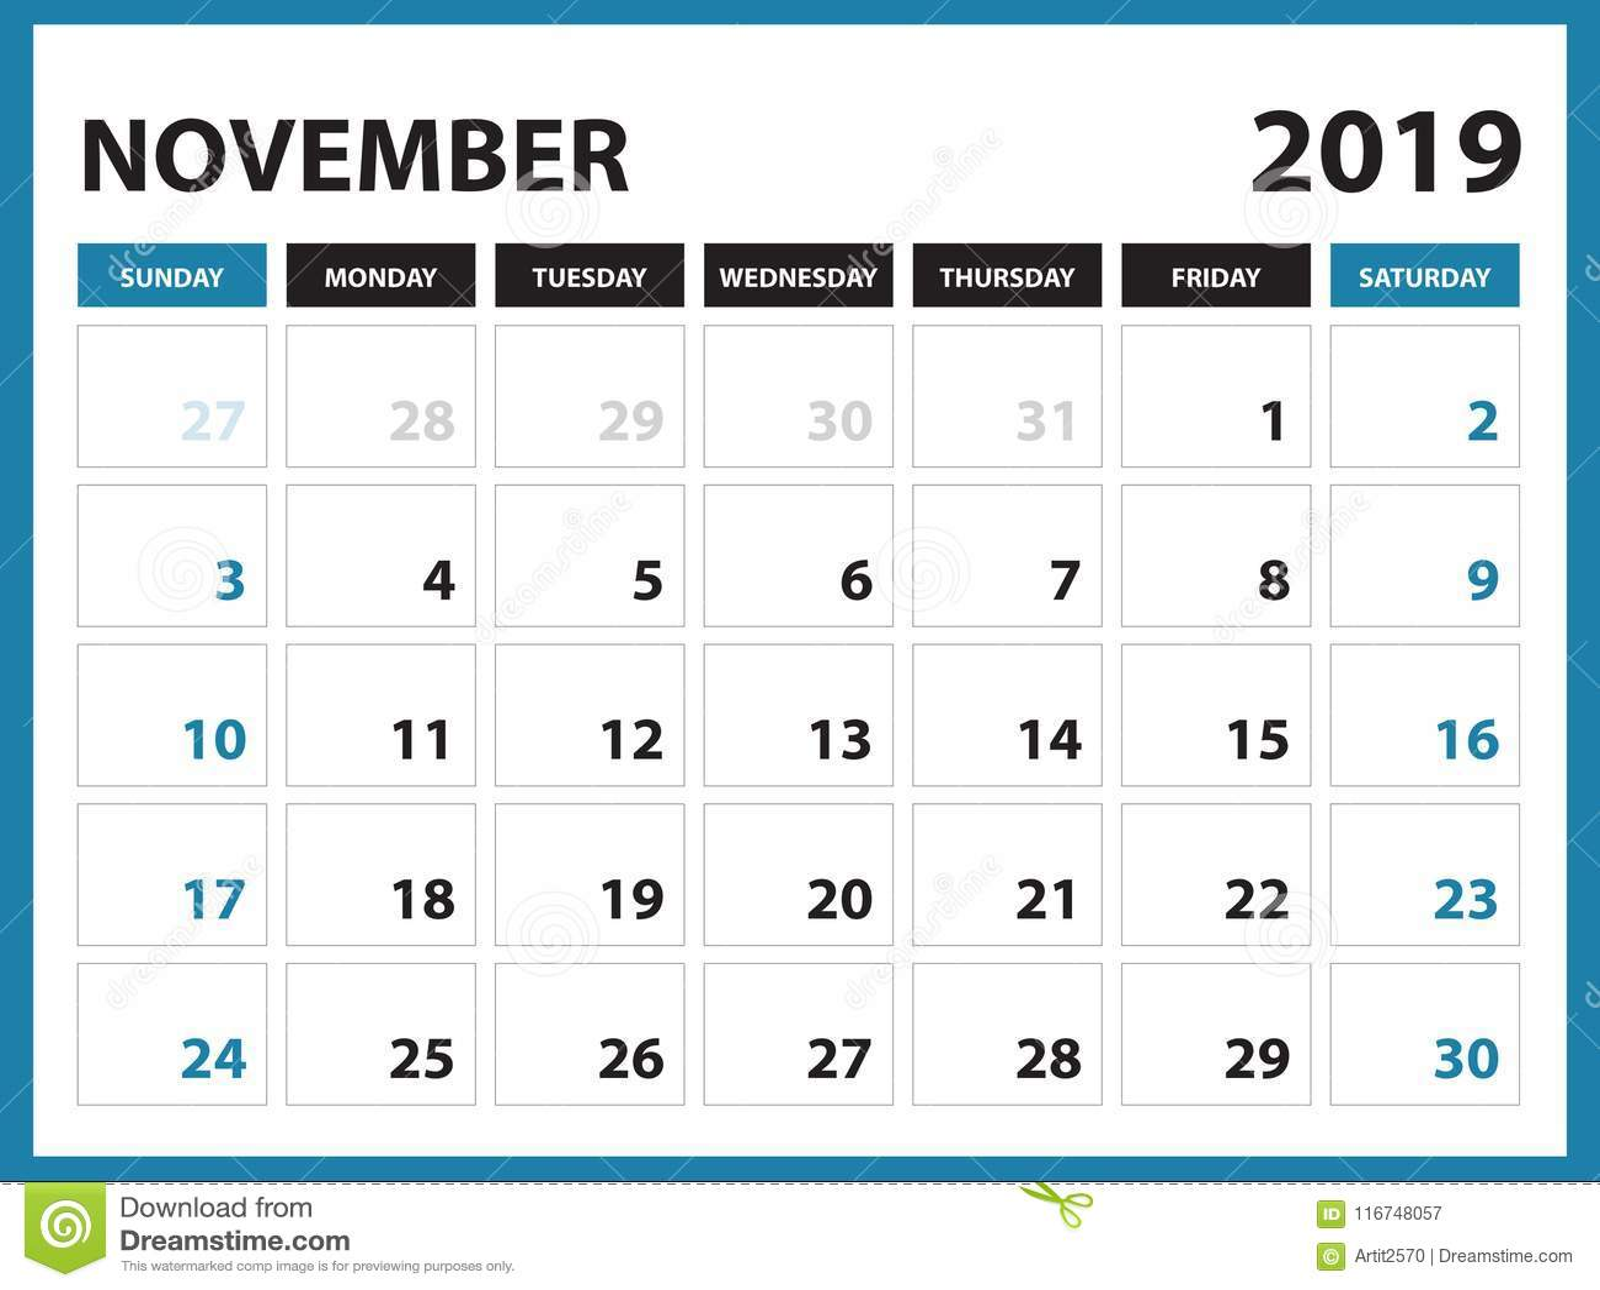 Calendrier Mois De Novembre 2019.Le Calendrier De Bureau Pour Le Calibre De Novembre 2019